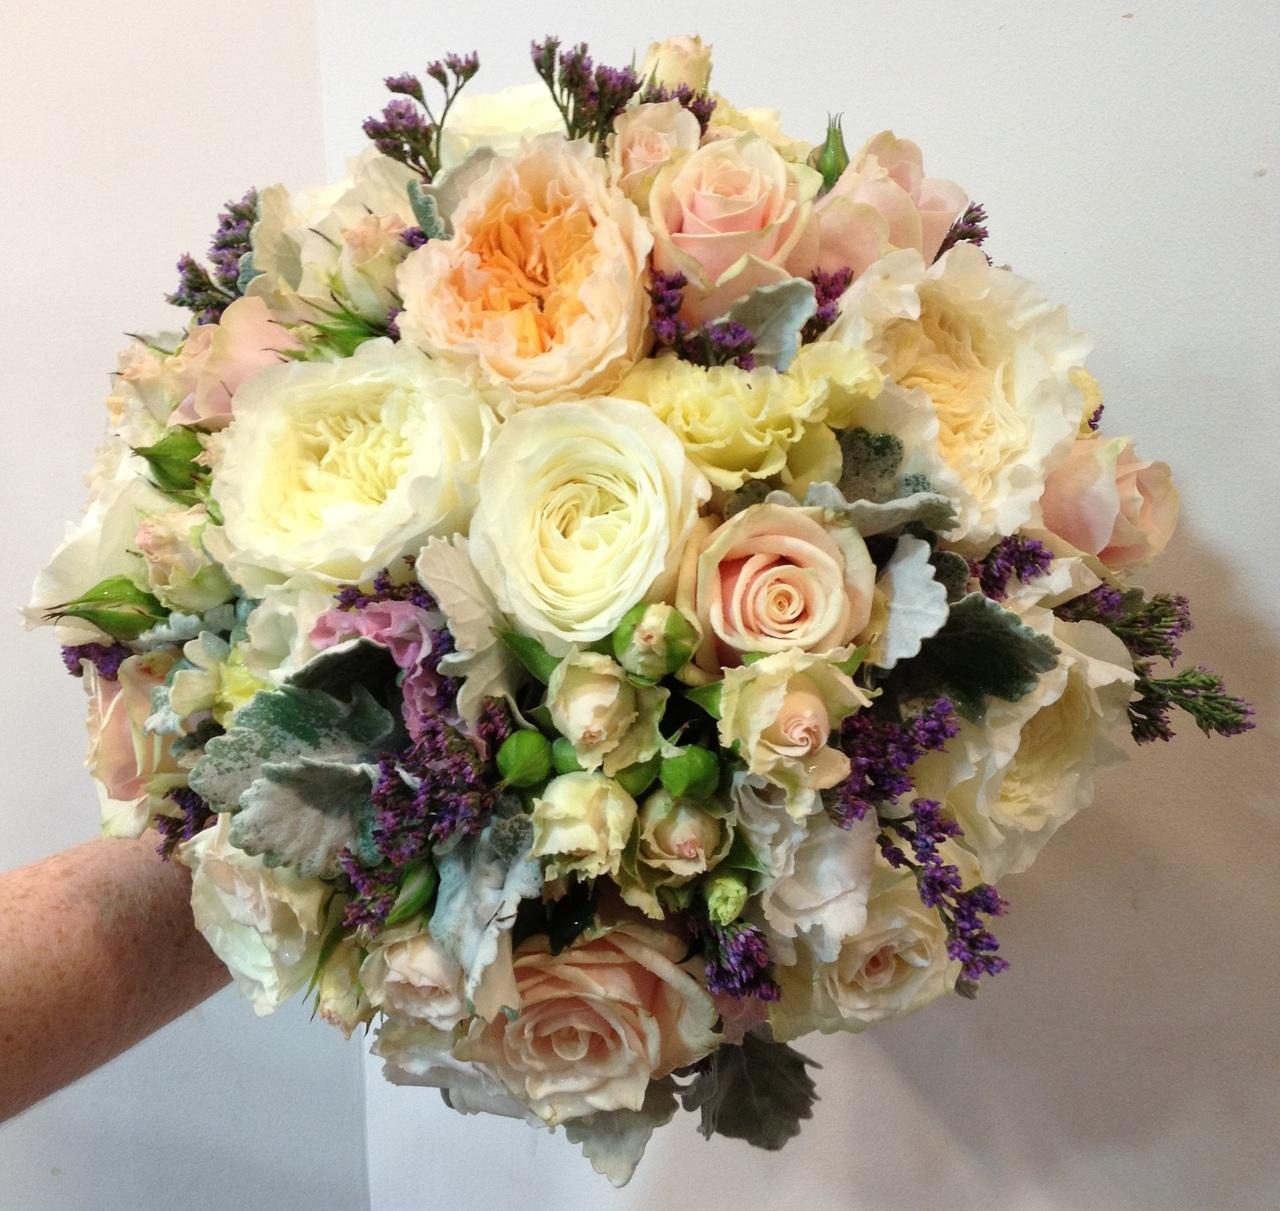 country-wedding-bouquet-44975.1413287608.jpg